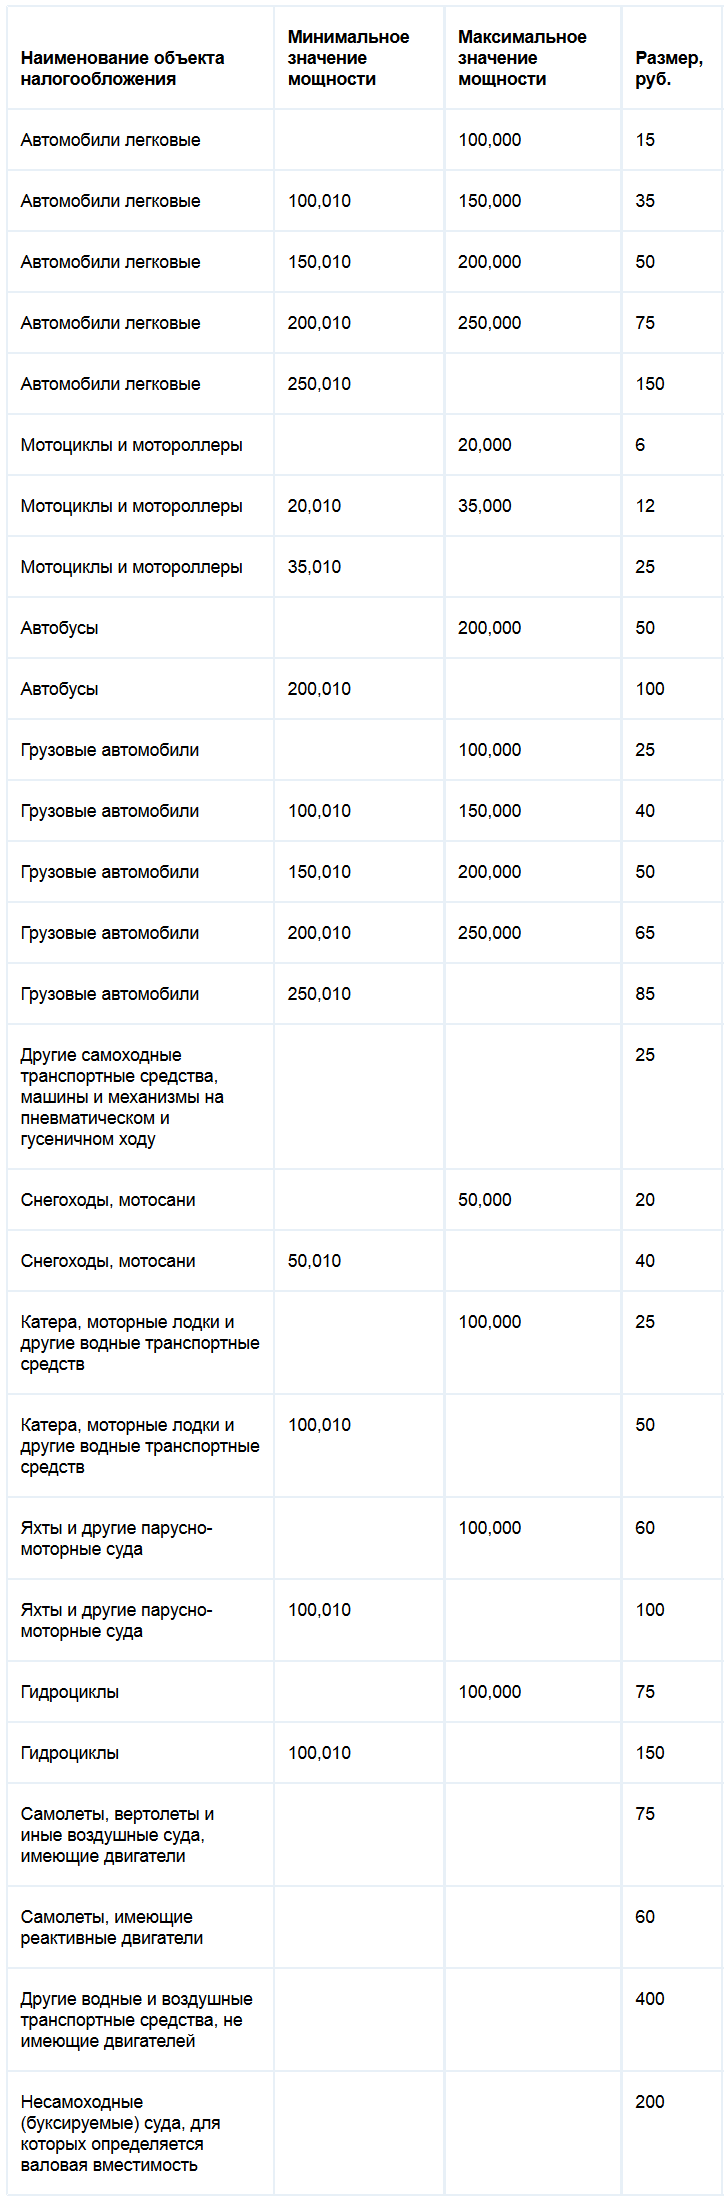 Ставки транспортного налога Орловской области